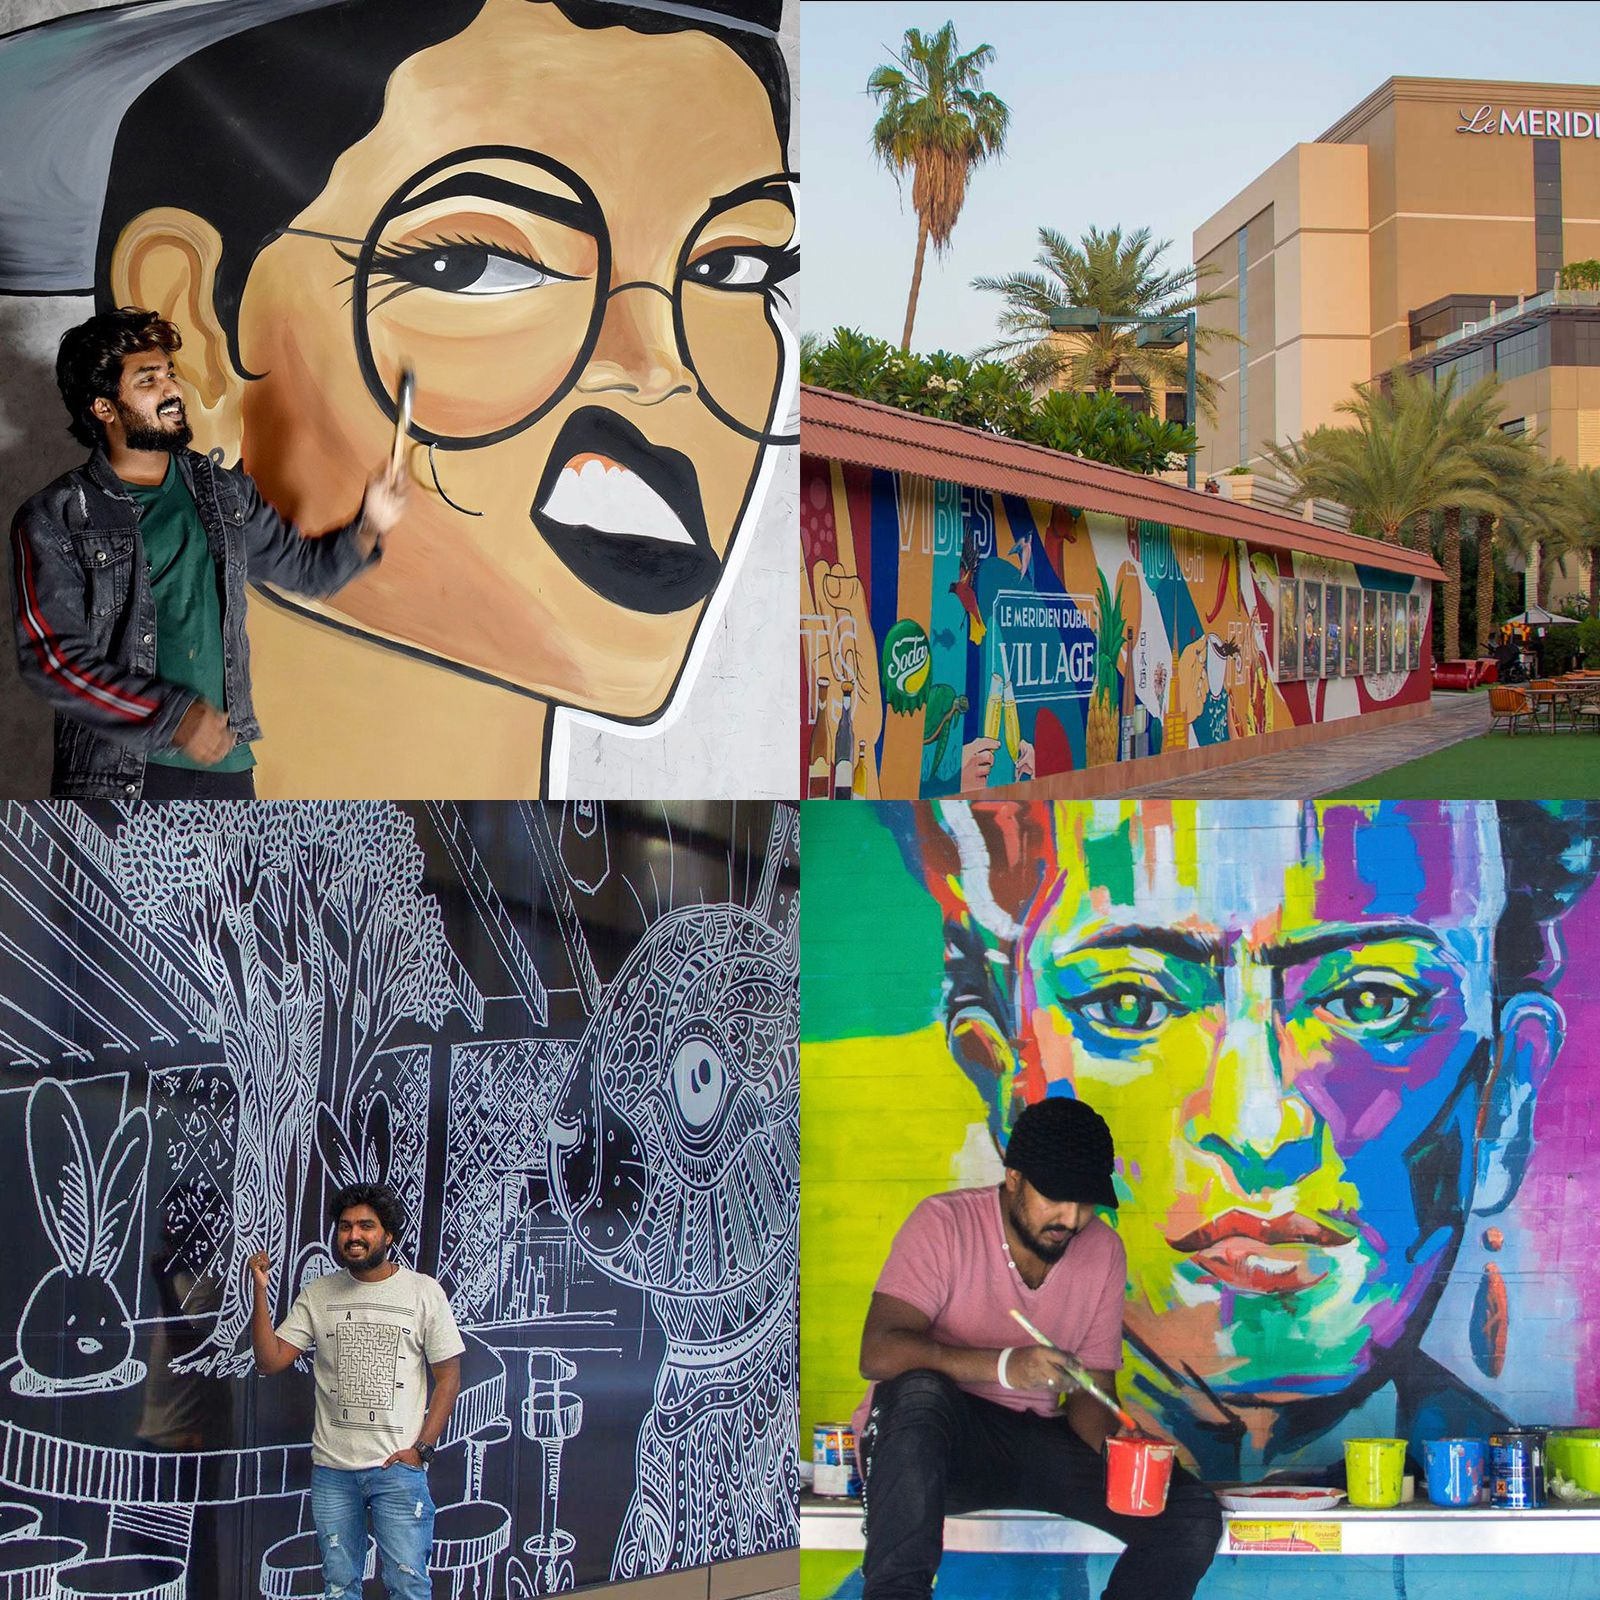 Indoor & Outdoor Art Projects by Sijin Gopinathan - Dubai, UAE